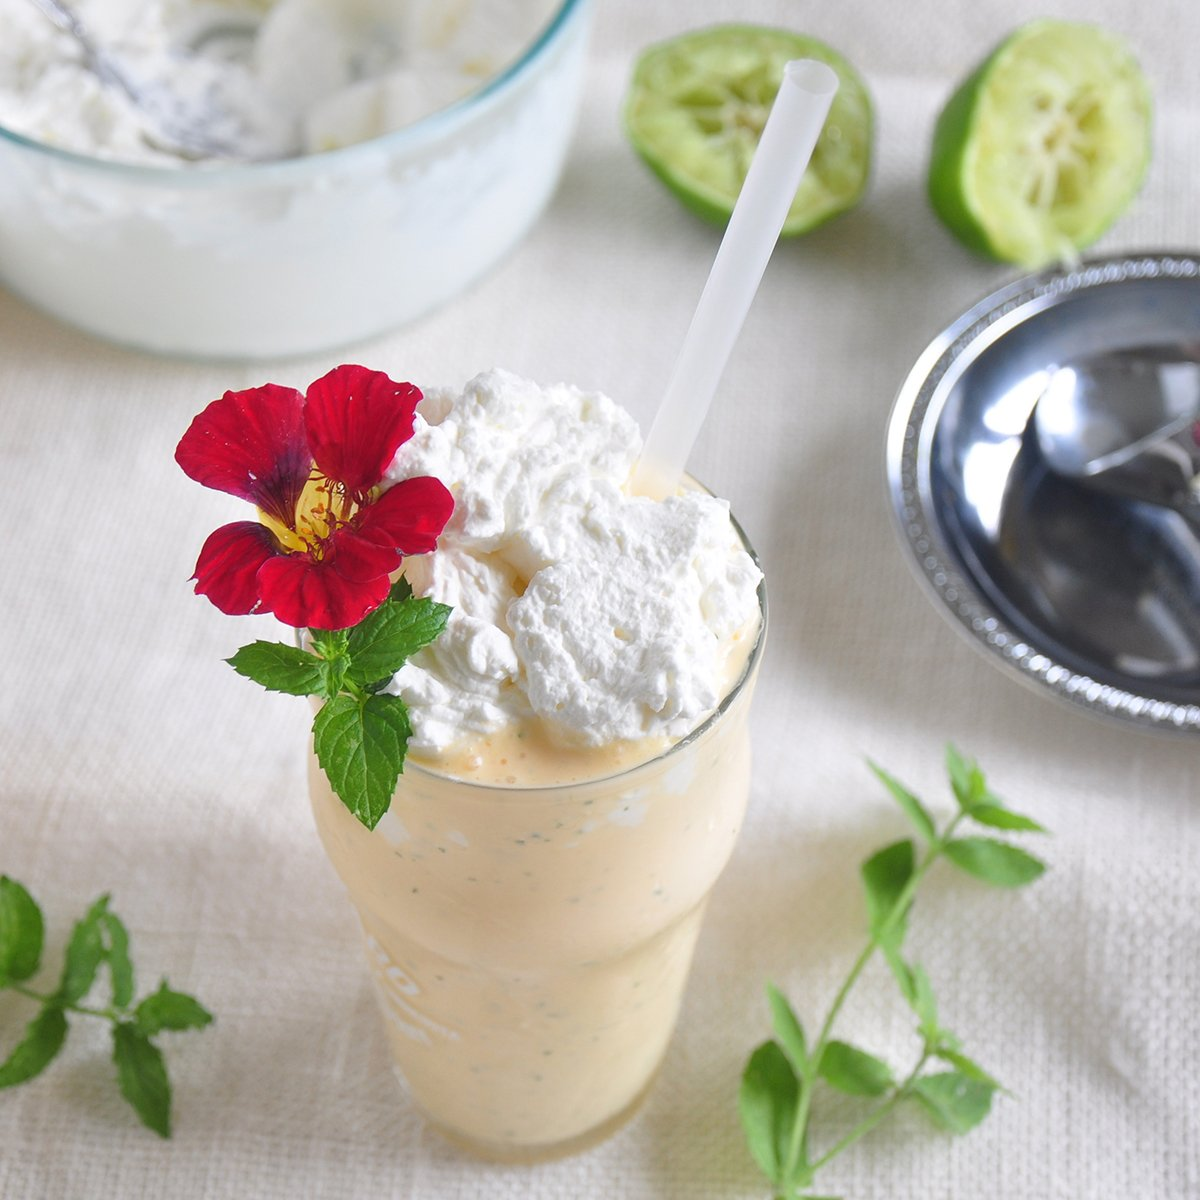 The Mojitarita Milkshake - a mint margarita dessert